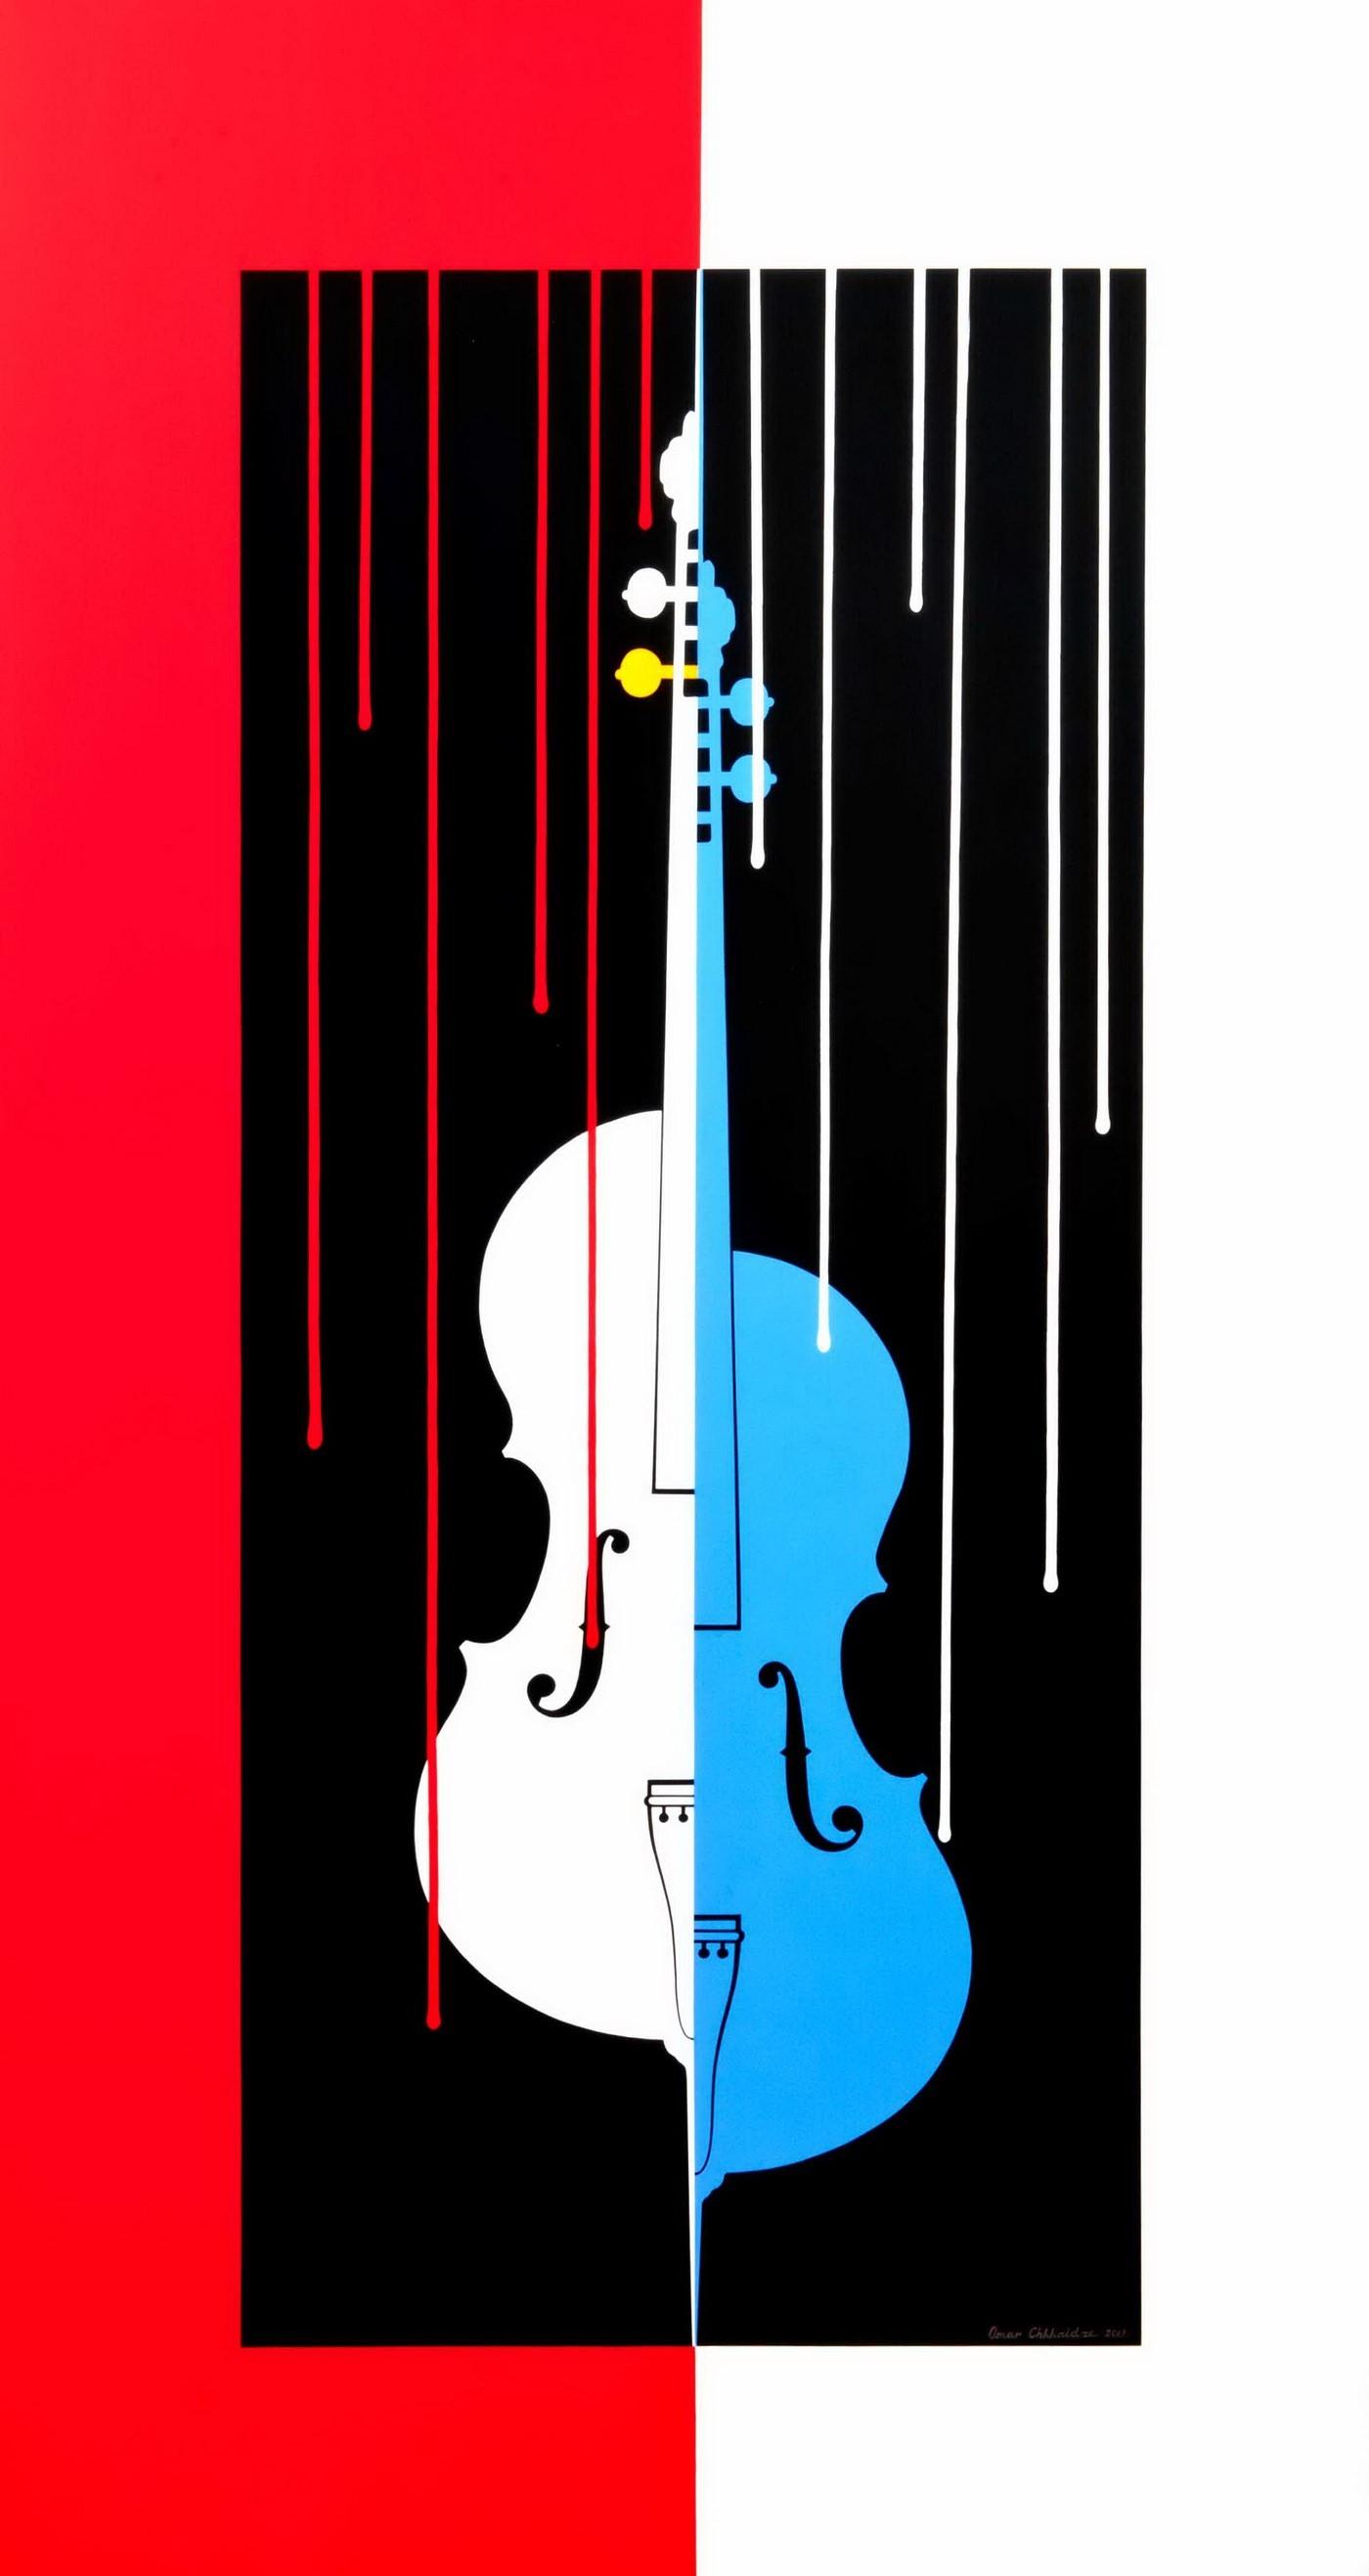 Музыка Света. 2013, х.акр